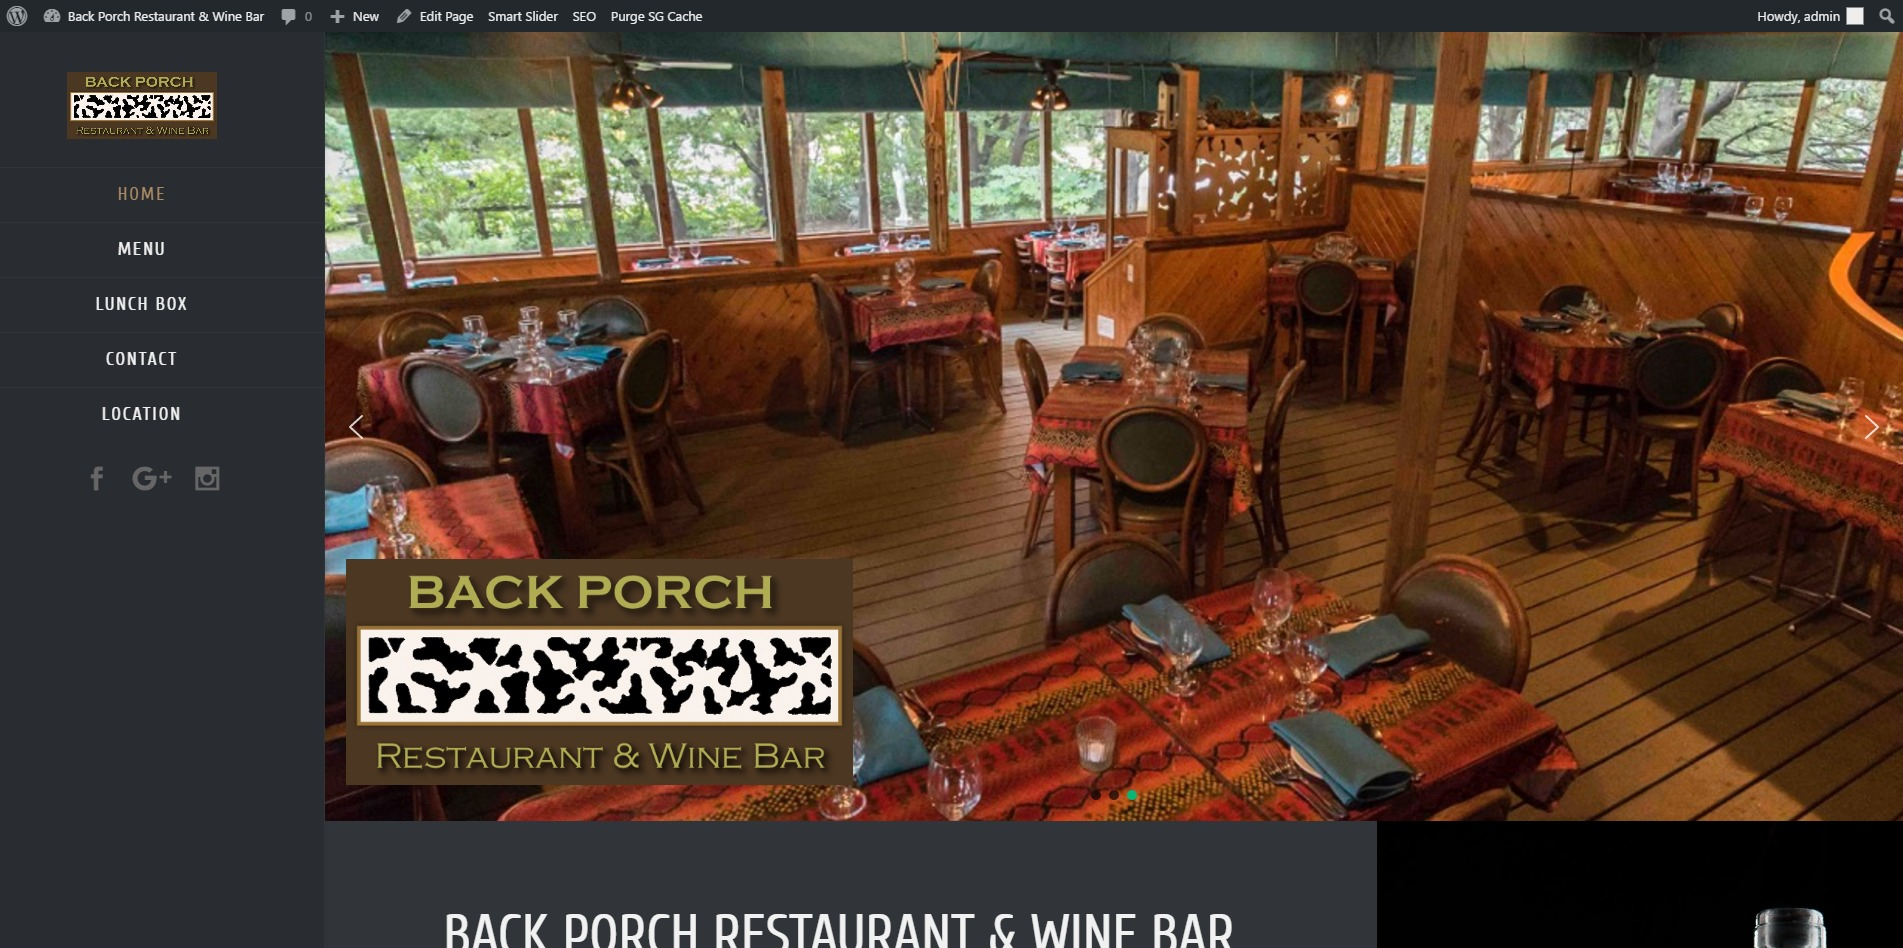 BACK PORCH RESTAURANT & WINE BAR